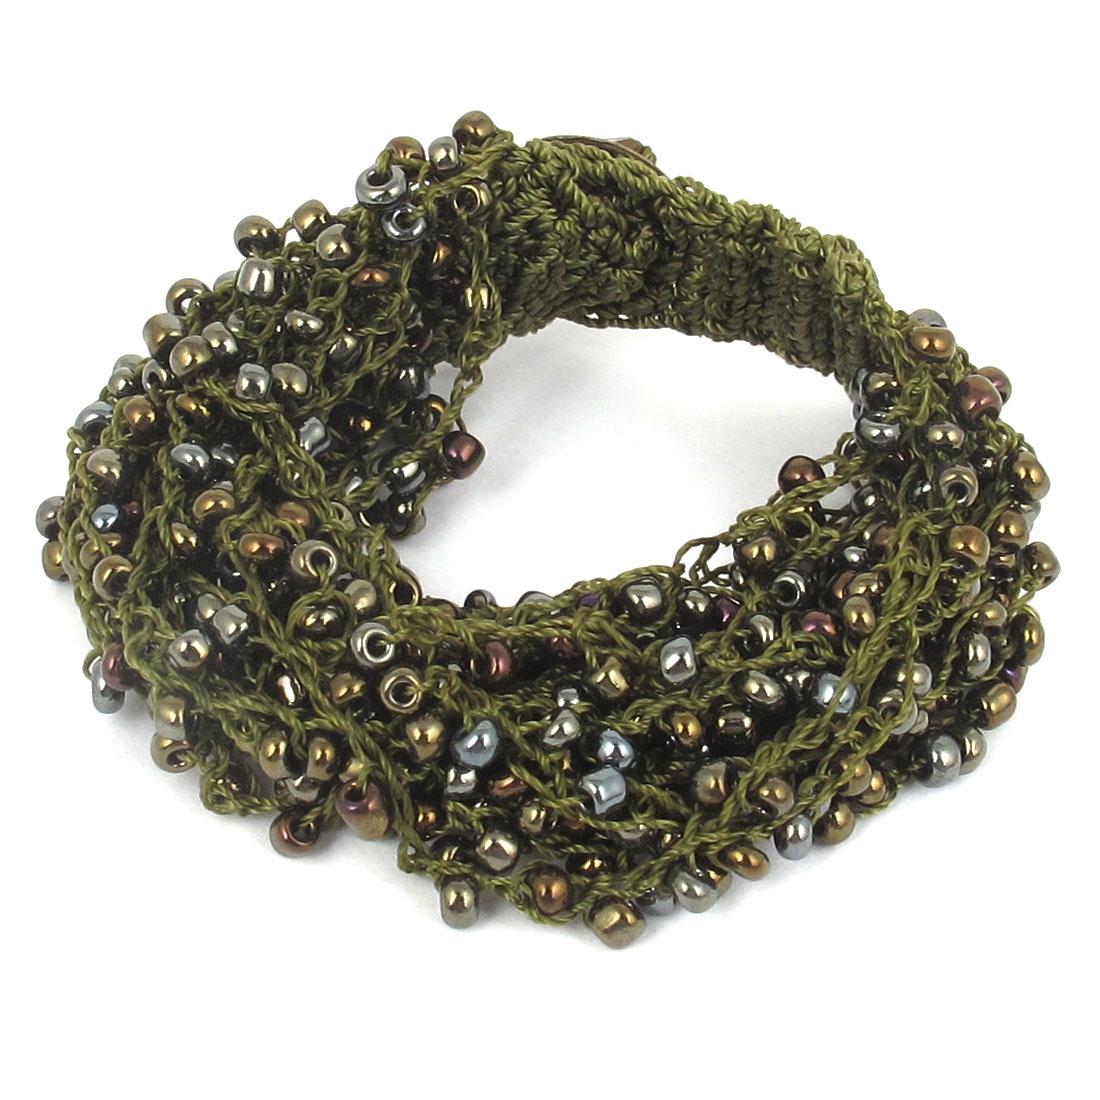 Women National Style Plastic Beaded Multi-layer Buttoned Bangle Bracelet Olive Green